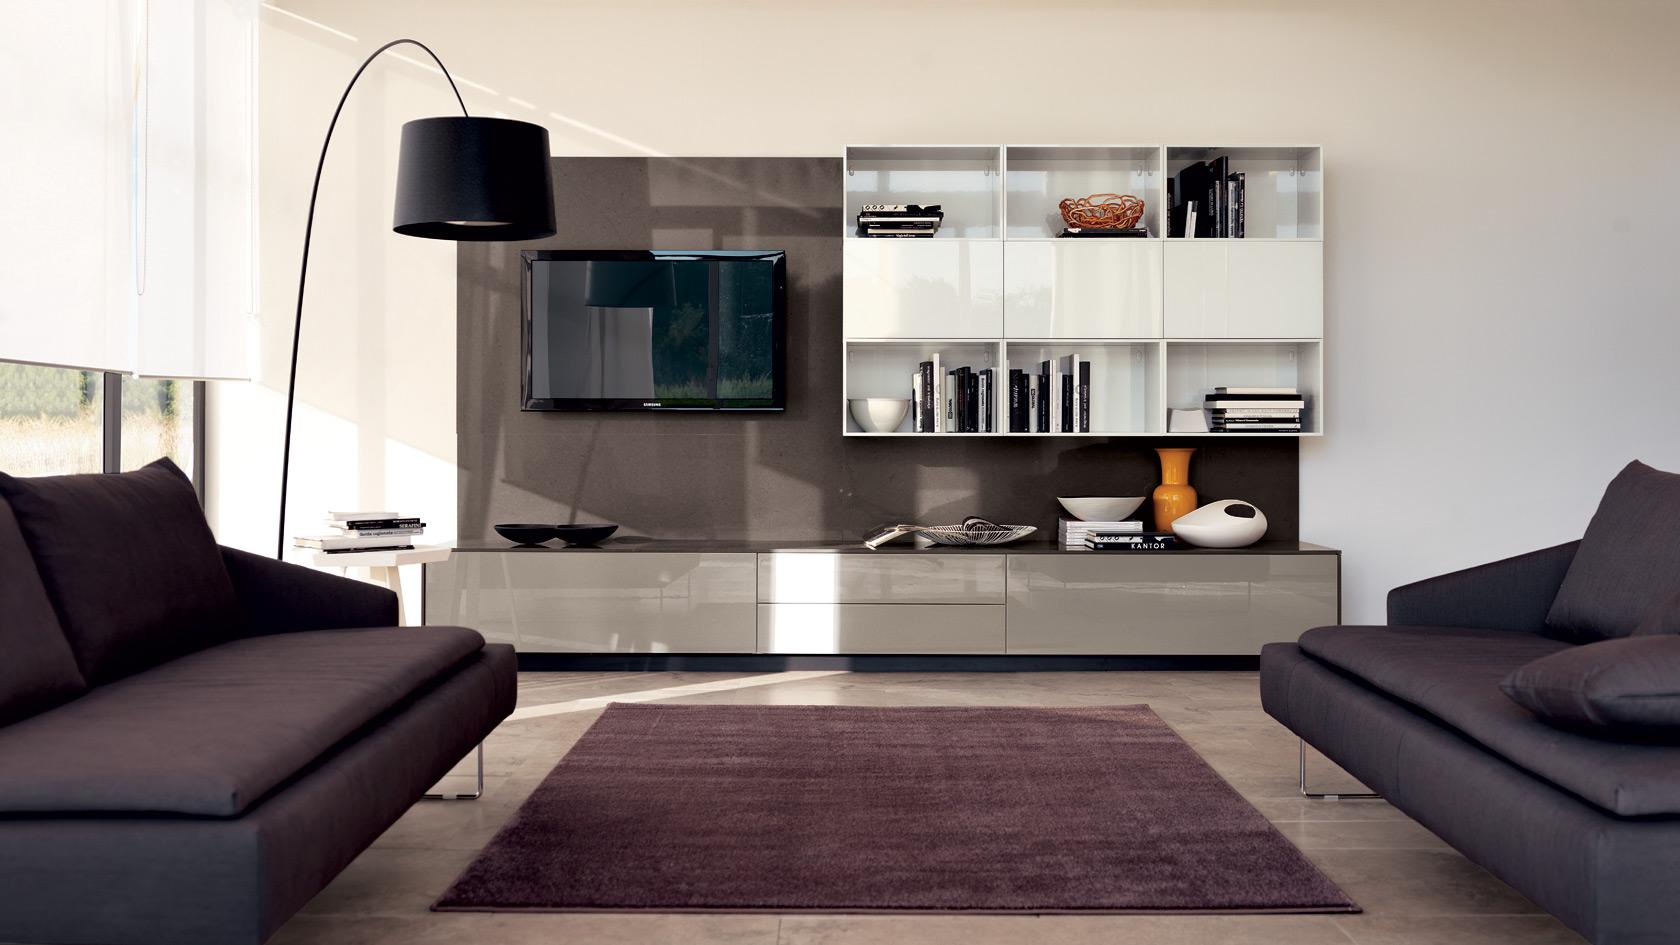 The interior in the Scandinavian style5.jpg